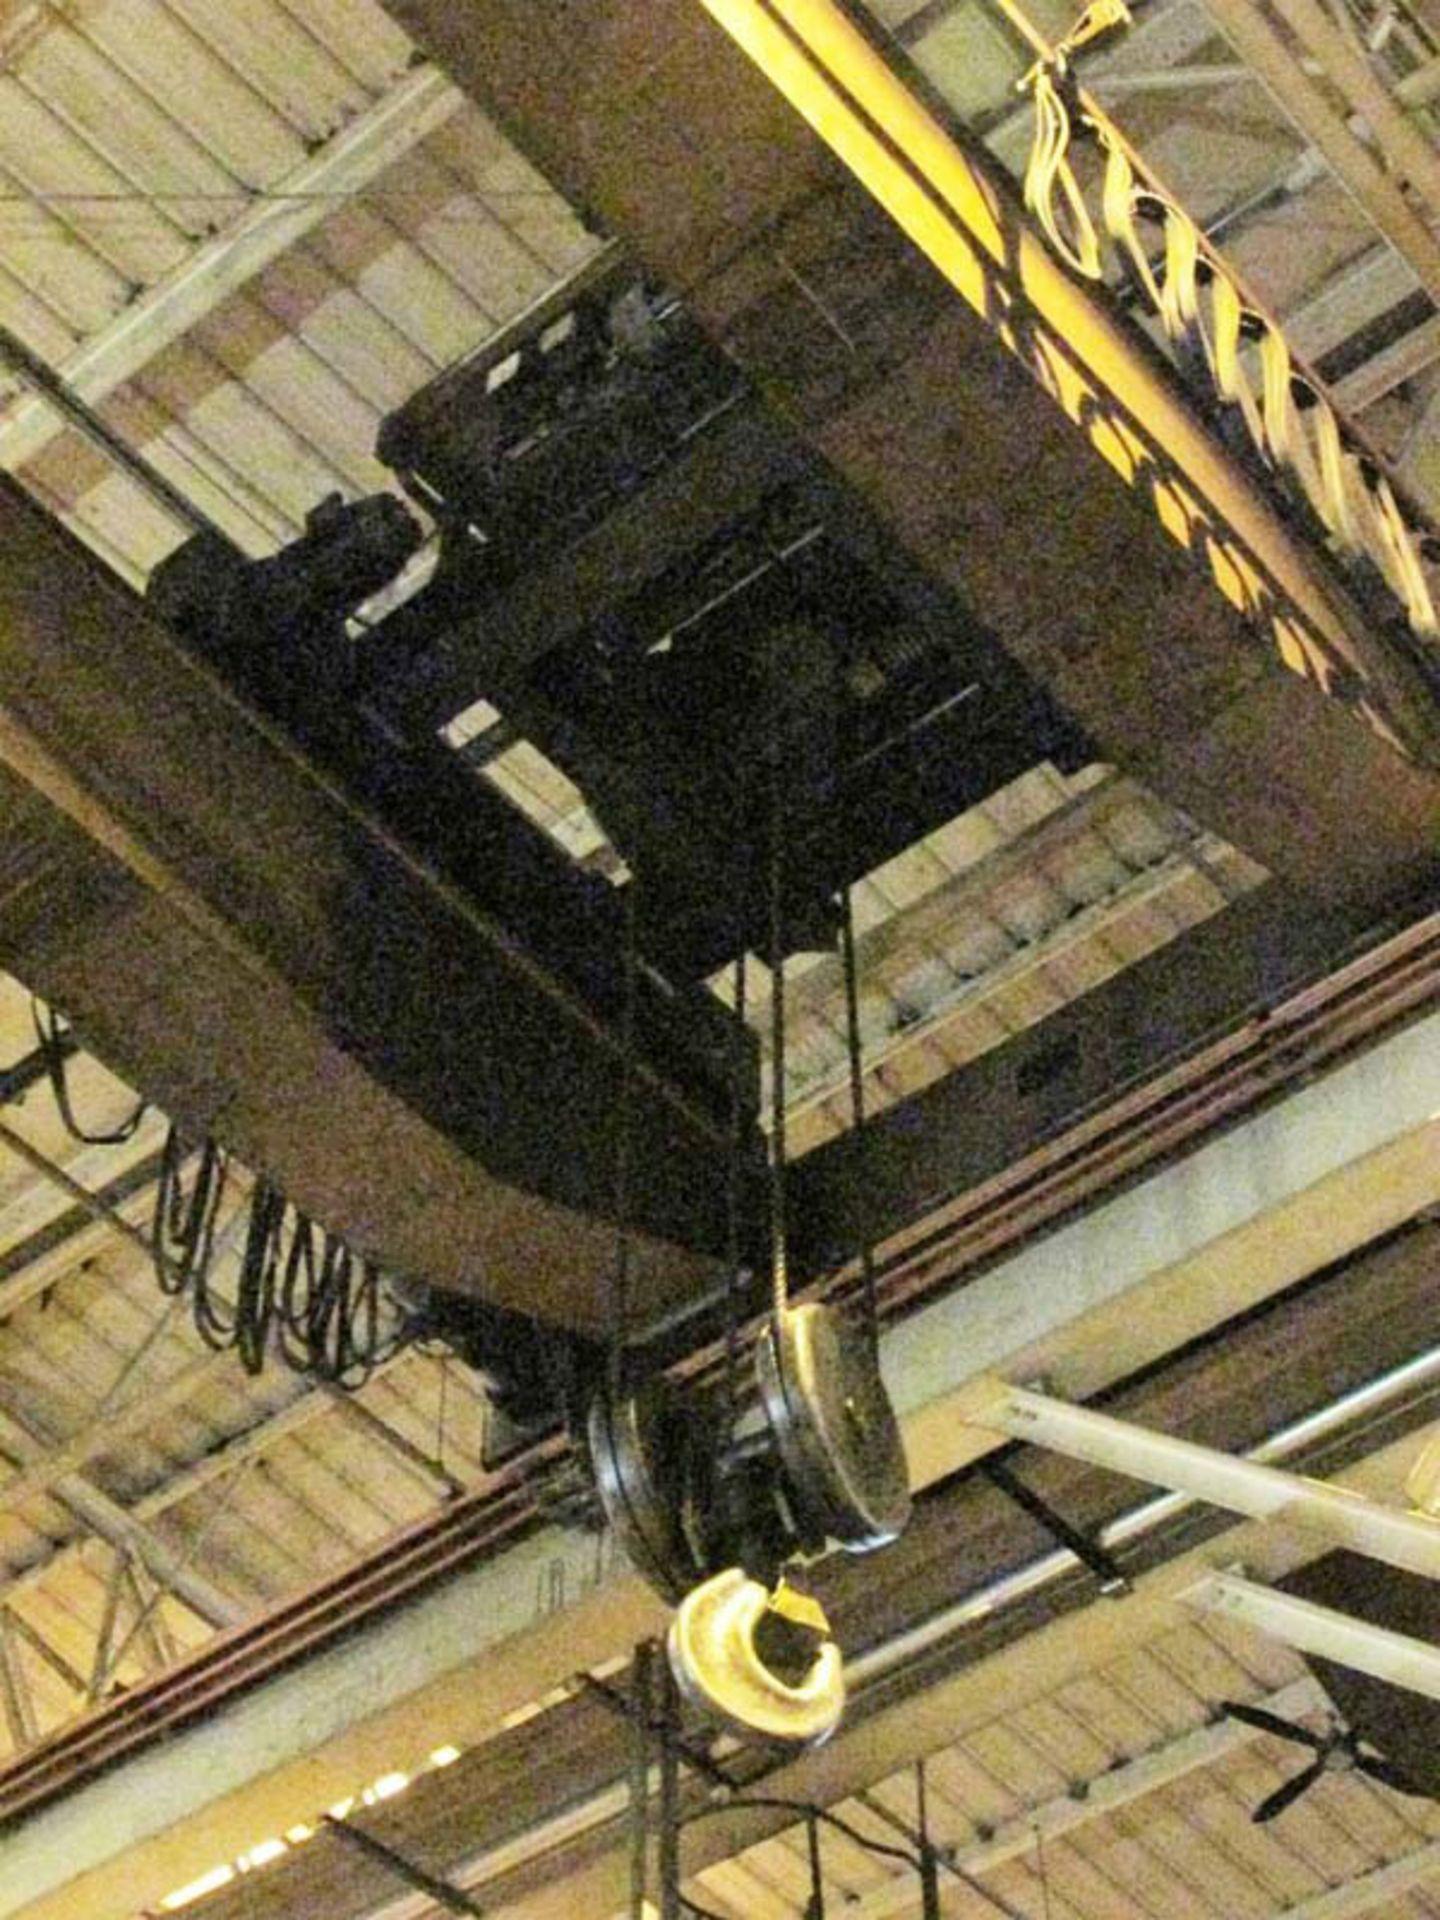 Demag Top Riding Double Girder Bridge Crane | 25-Ton x 50', Mdl: N/A, S/N: 75066 - 8398P - Image 4 of 10